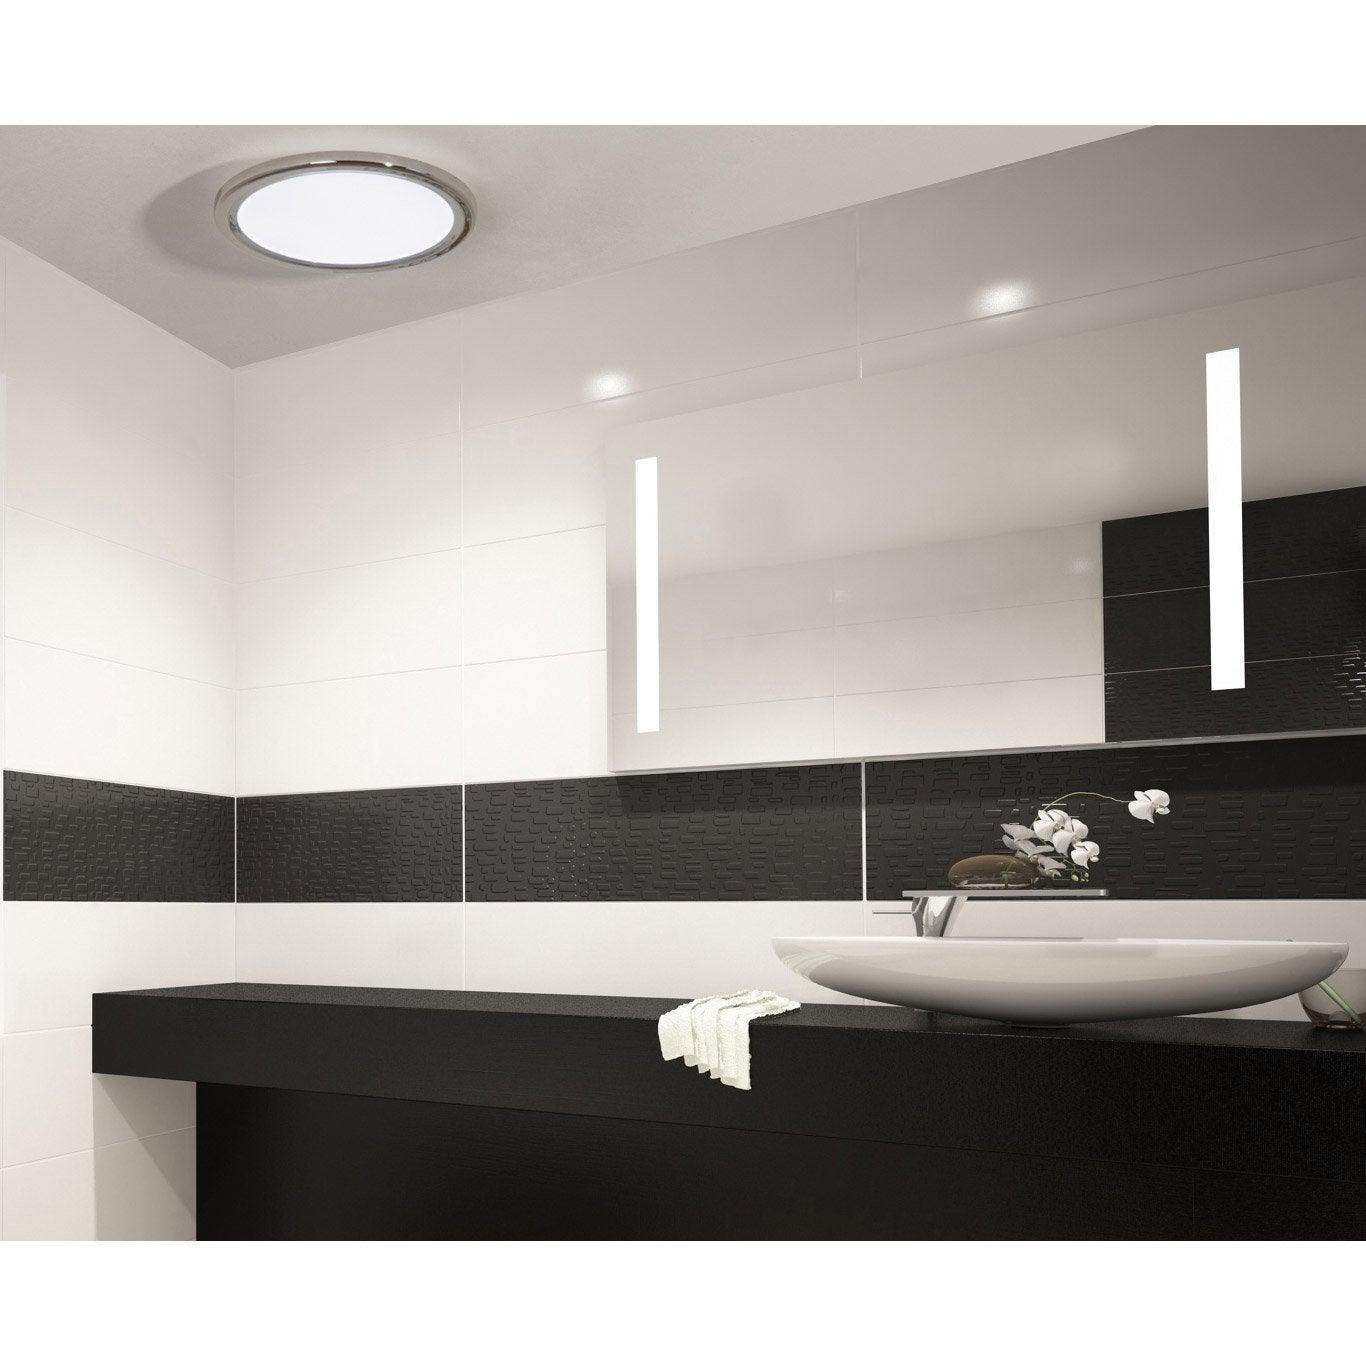 Plafonnier Palin, LED 1 x 24 W, LED intégrée blanc chaud